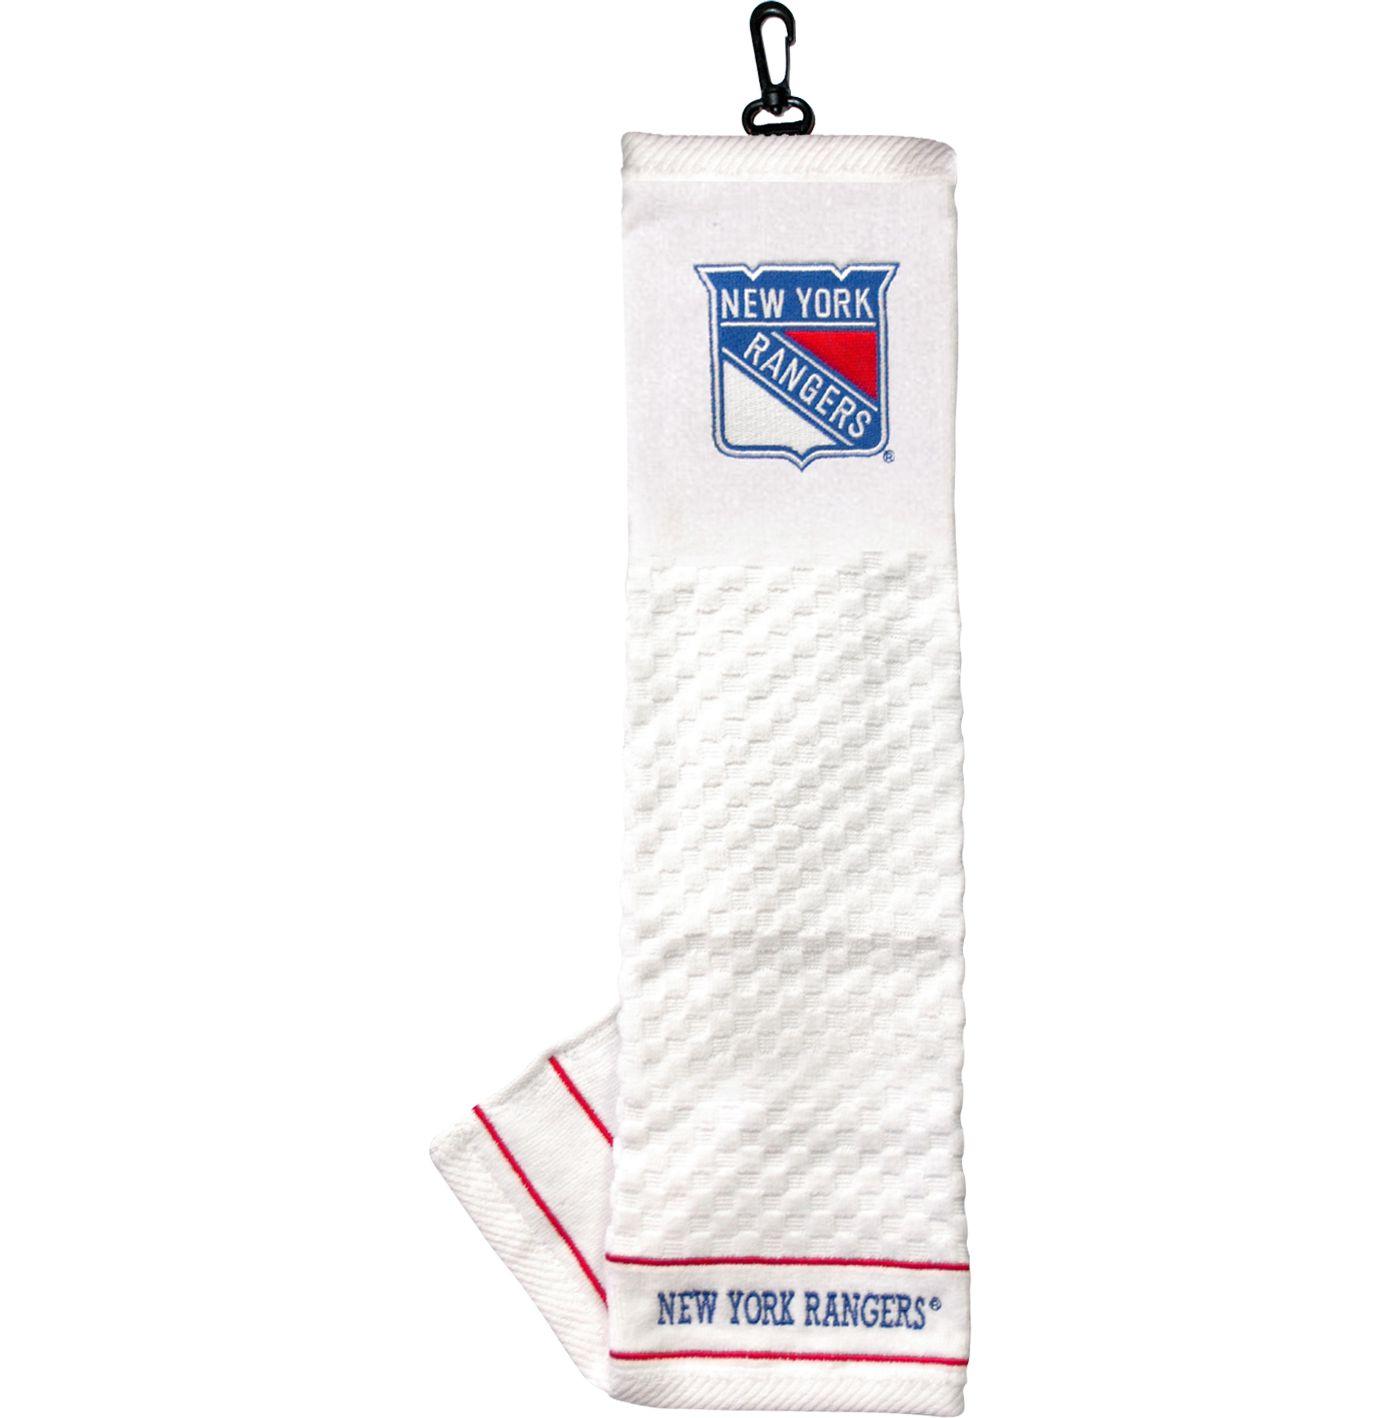 Team Golf New York Rangers Embroidered Towel